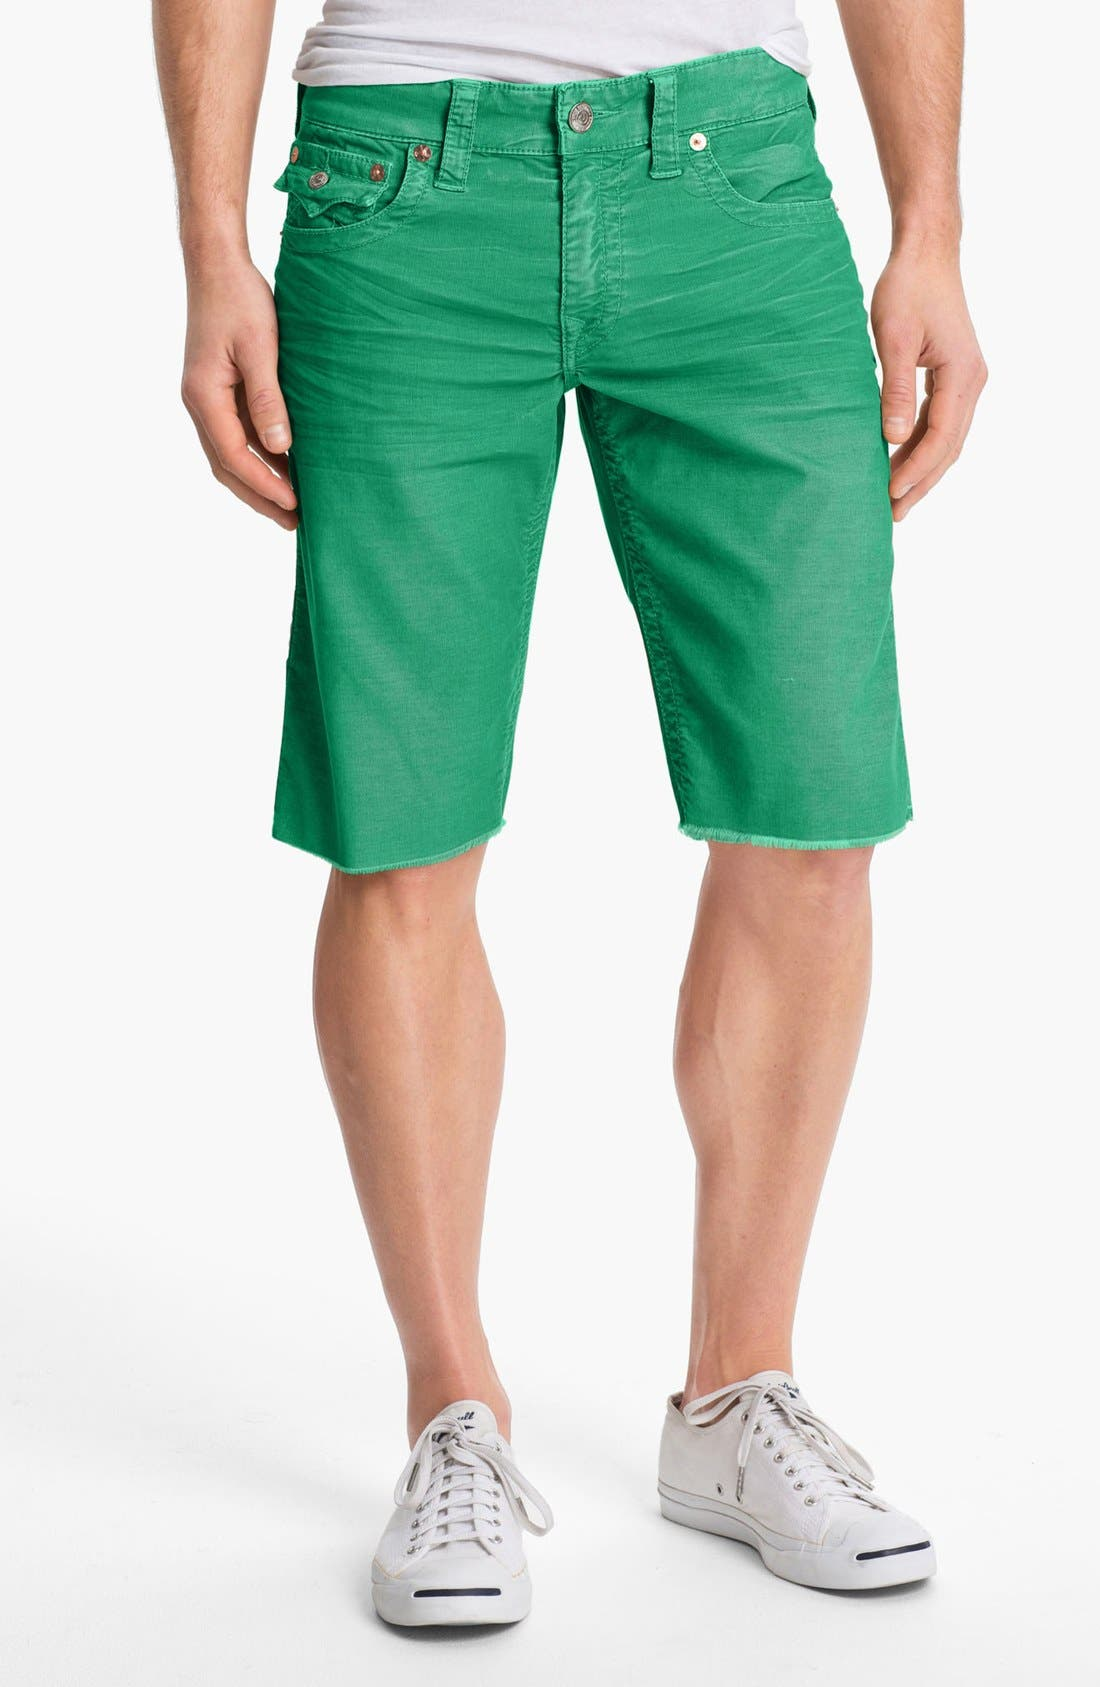 Main Image - True Religion Brand Jeans 'Ricky' Cutoff Corduroy Shorts